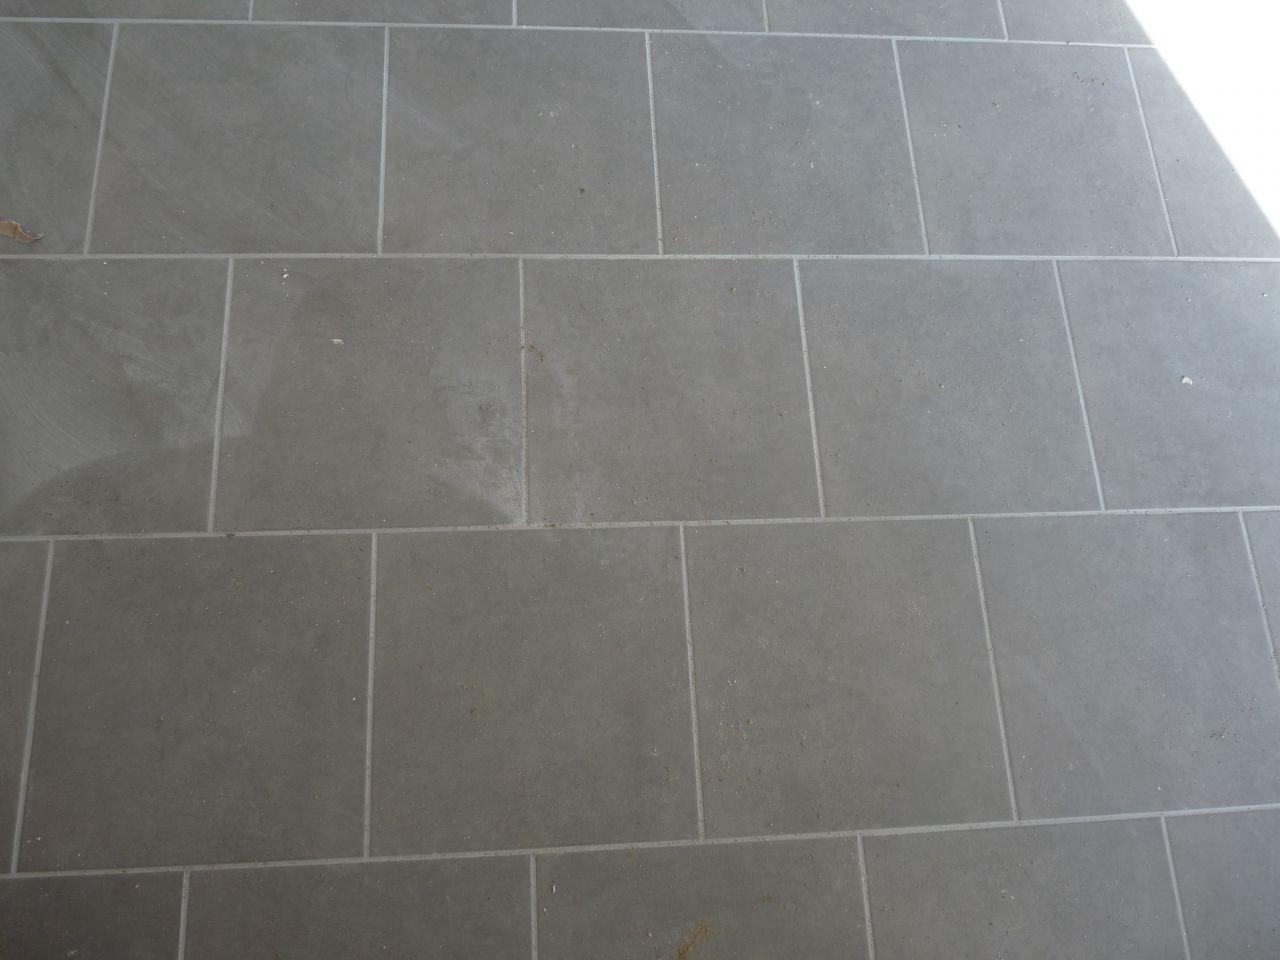 Carrelage et bandes plomberie terrassement erdf for Carrelage loiret